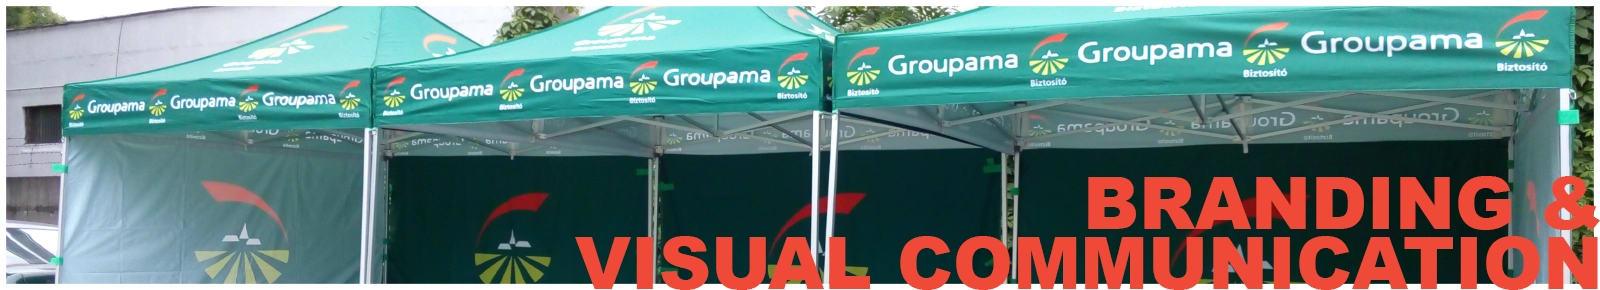 promotion marketing tent werbe zelt Personalizzazioni gazebo